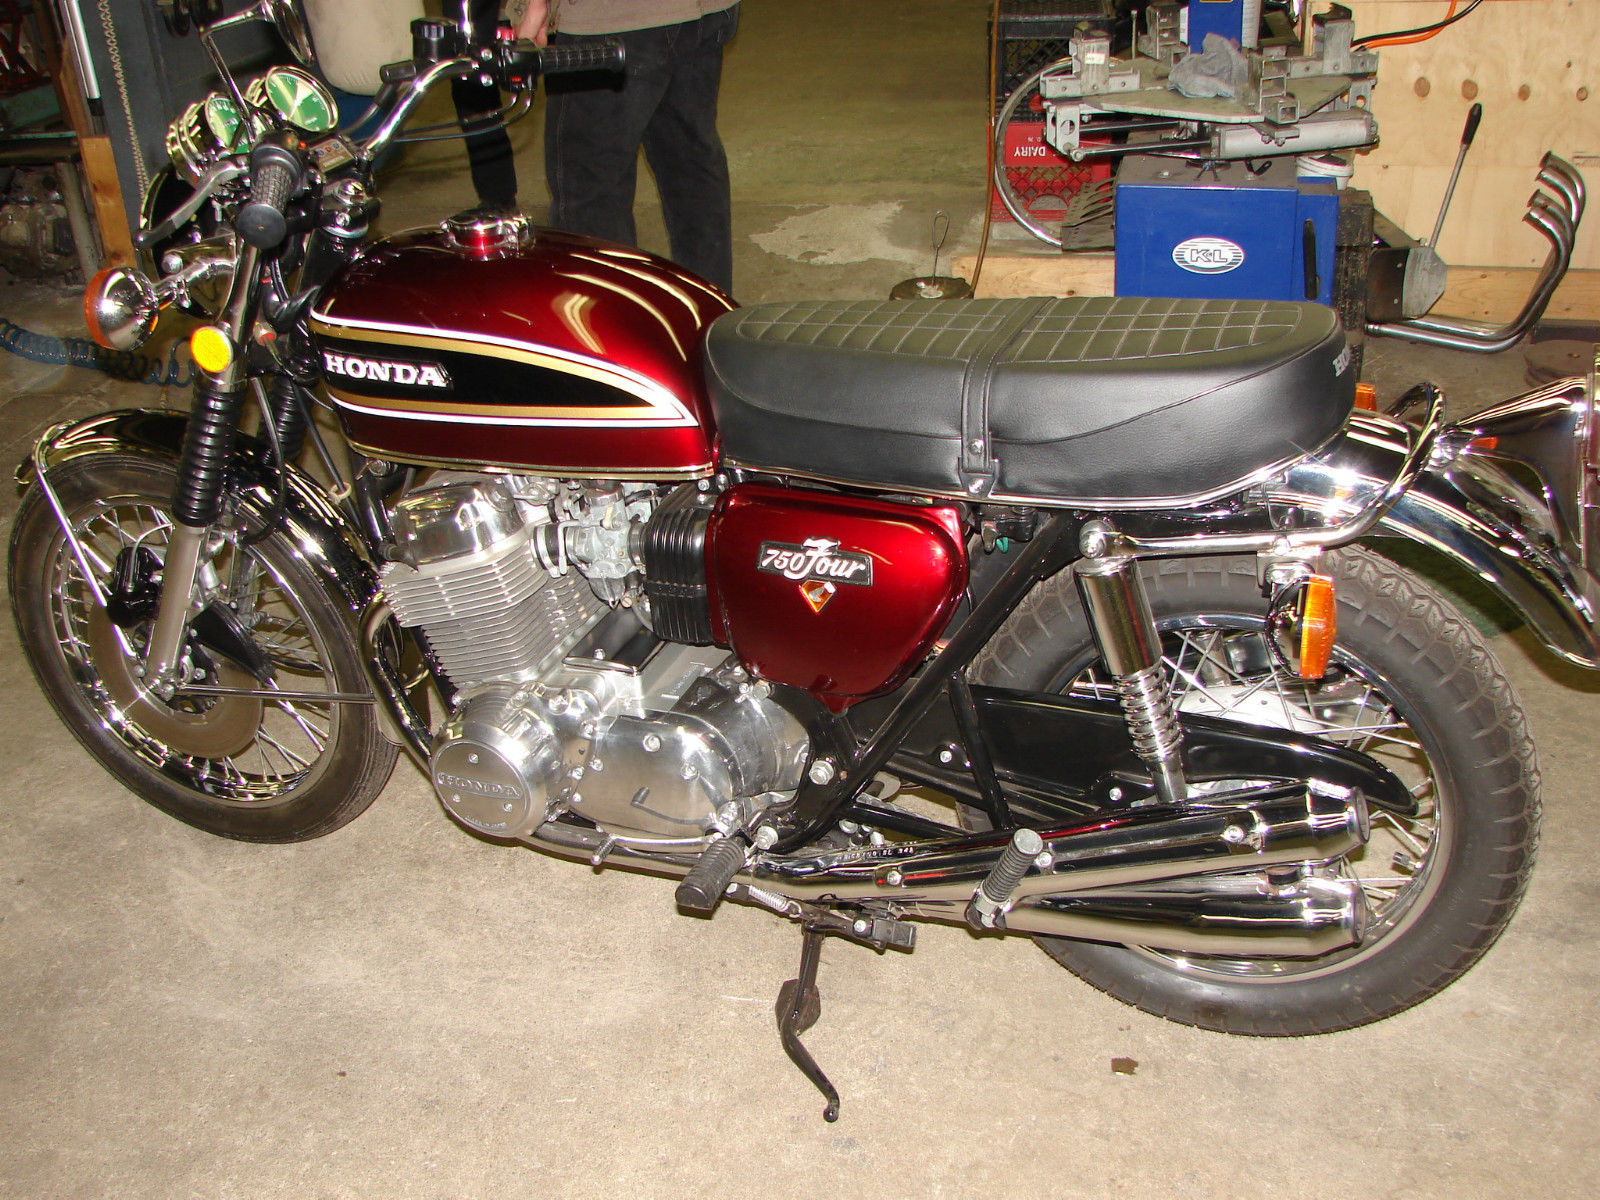 1976 Honda CB750 K6 Candy Antares Red